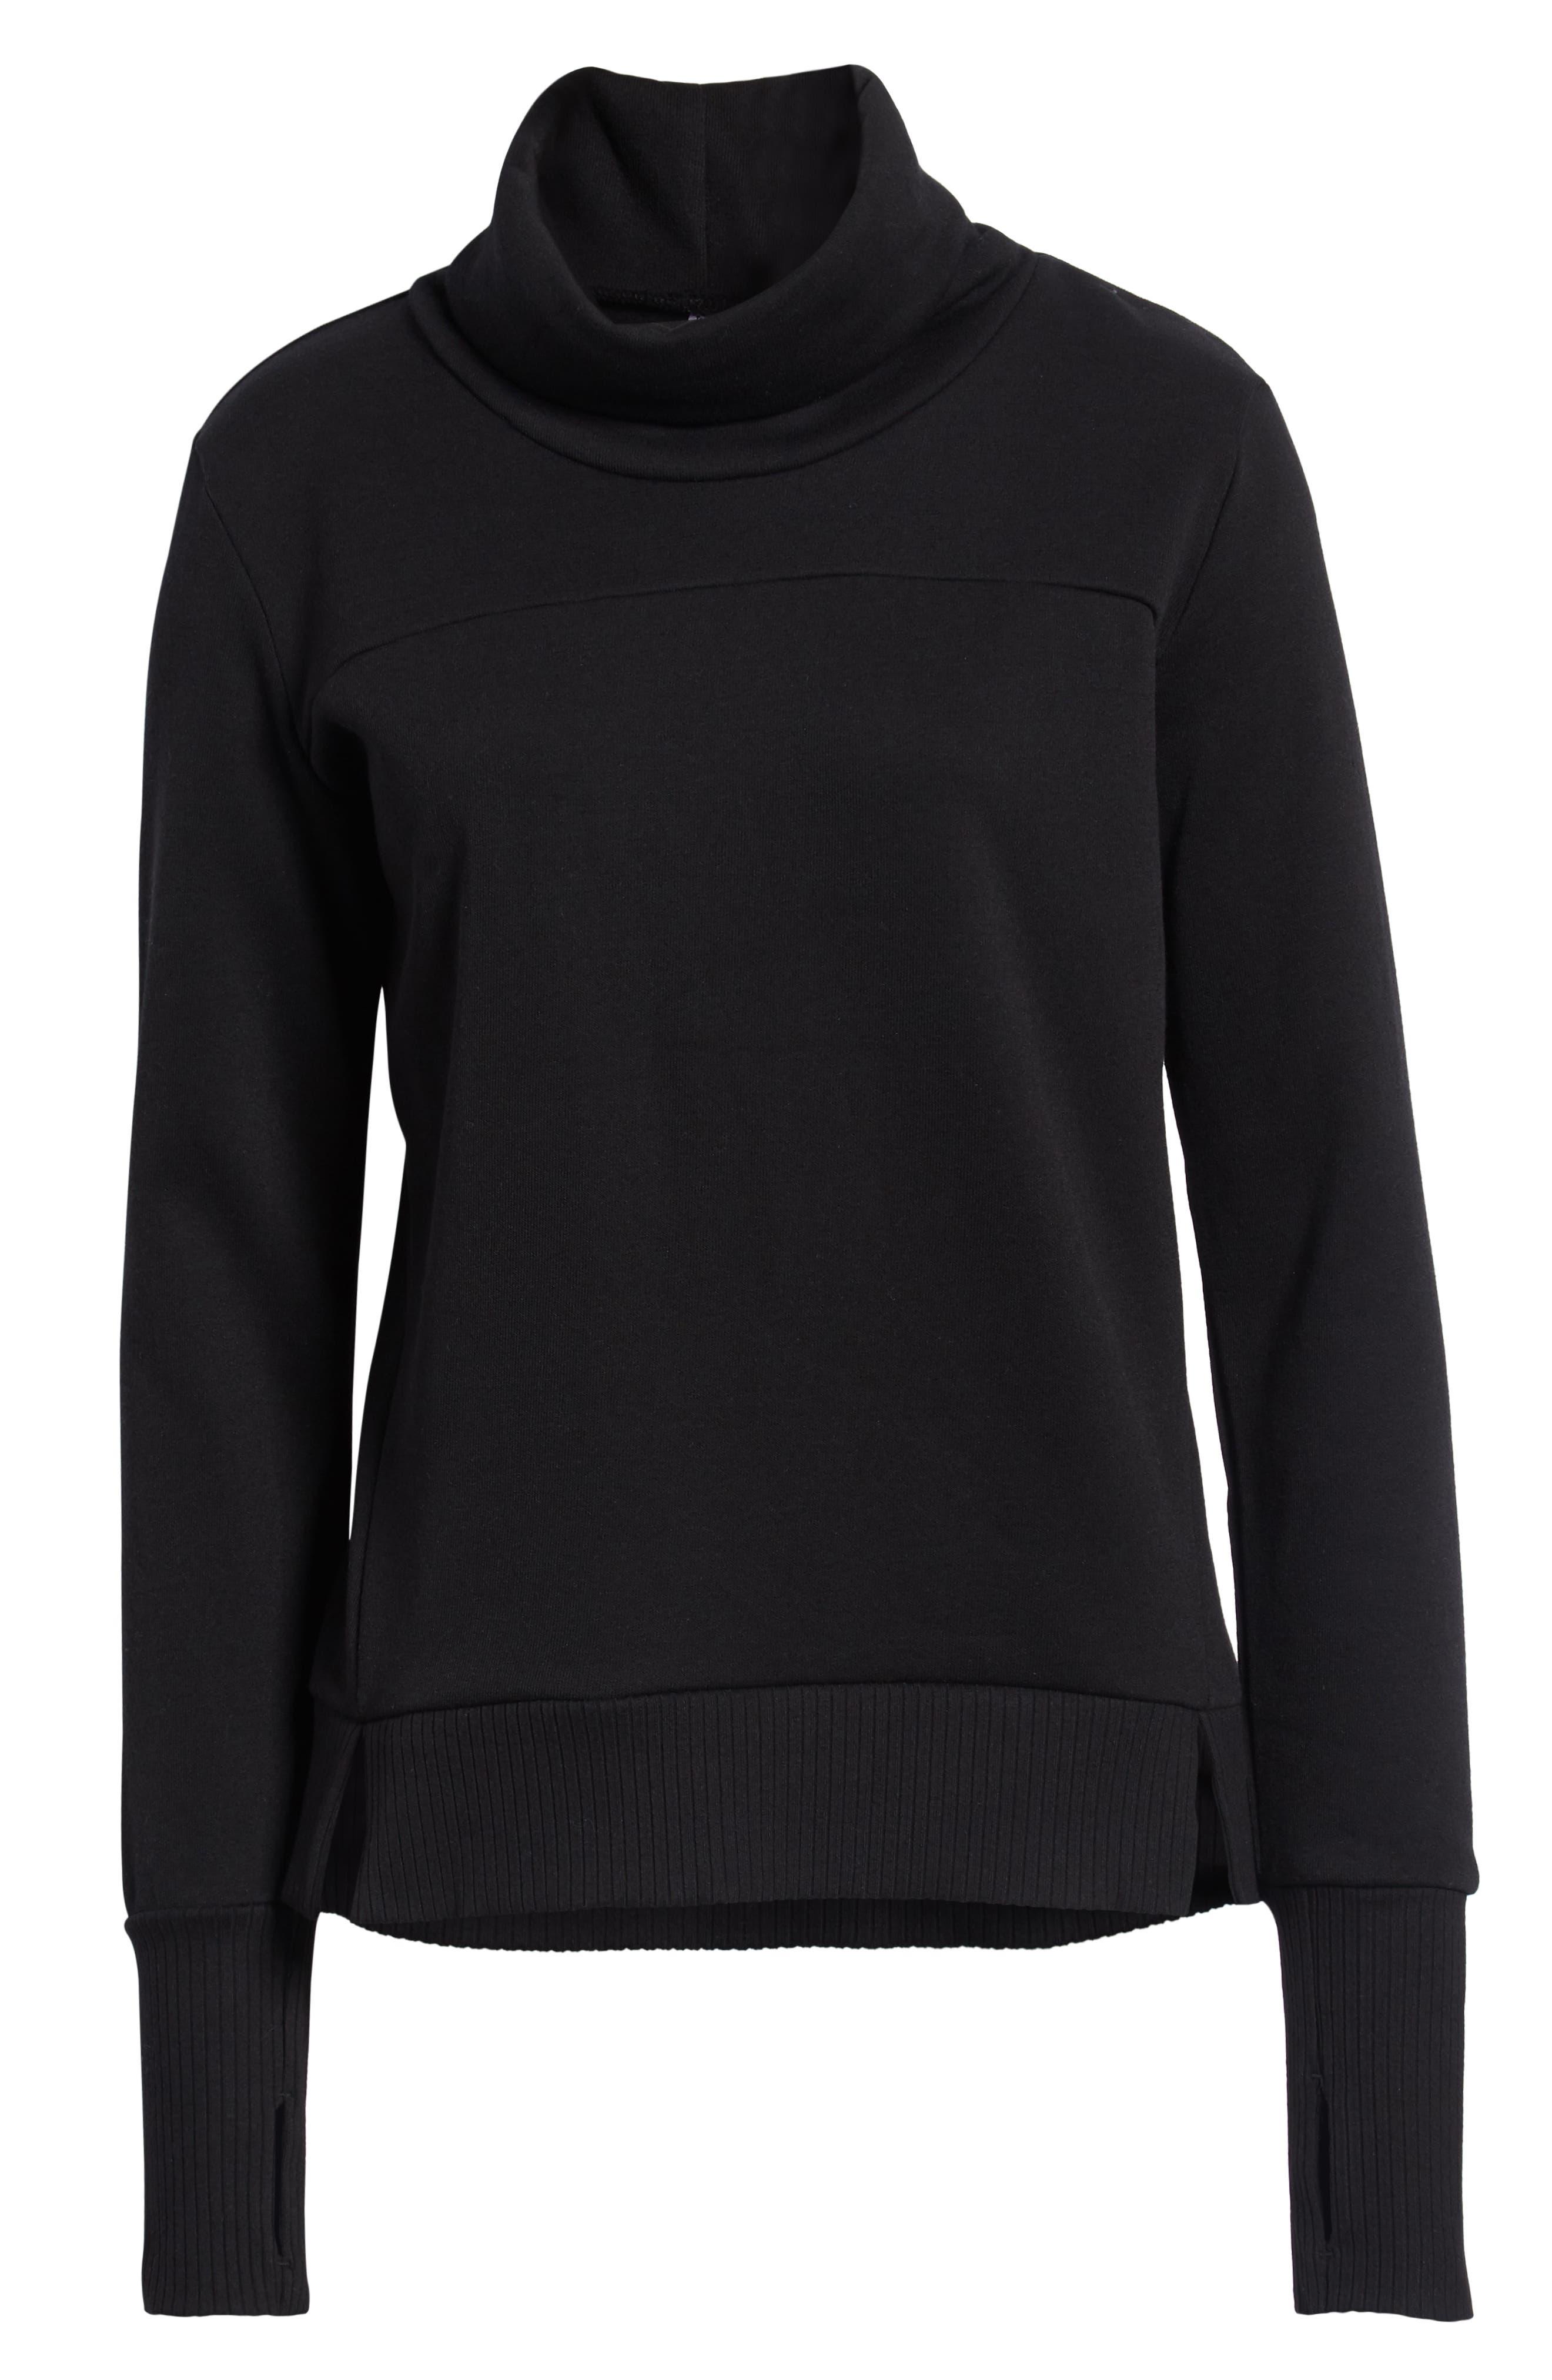 ALO,                             'Haze' Funnel Neck Sweatshirt,                             Alternate thumbnail 2, color,                             BLACK